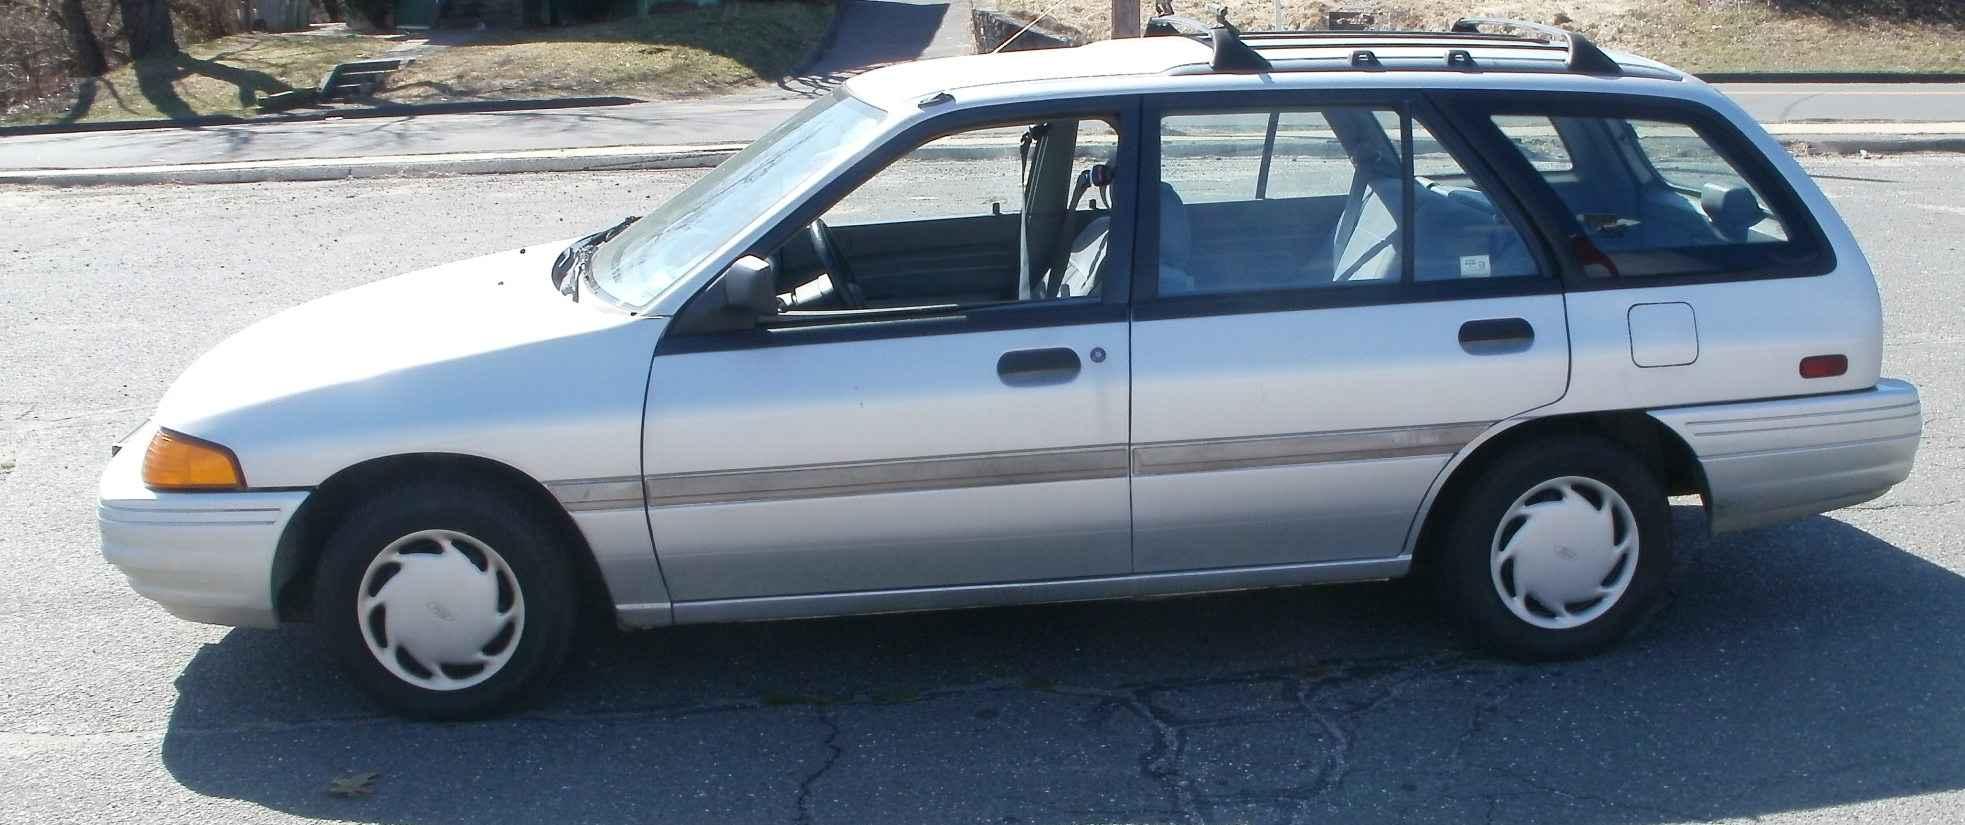 1993 ford escort information and photos zombiedrive rh zombdrive com 1993 ford escort manual transmission fill 1994 ford escort manual transmission fluid